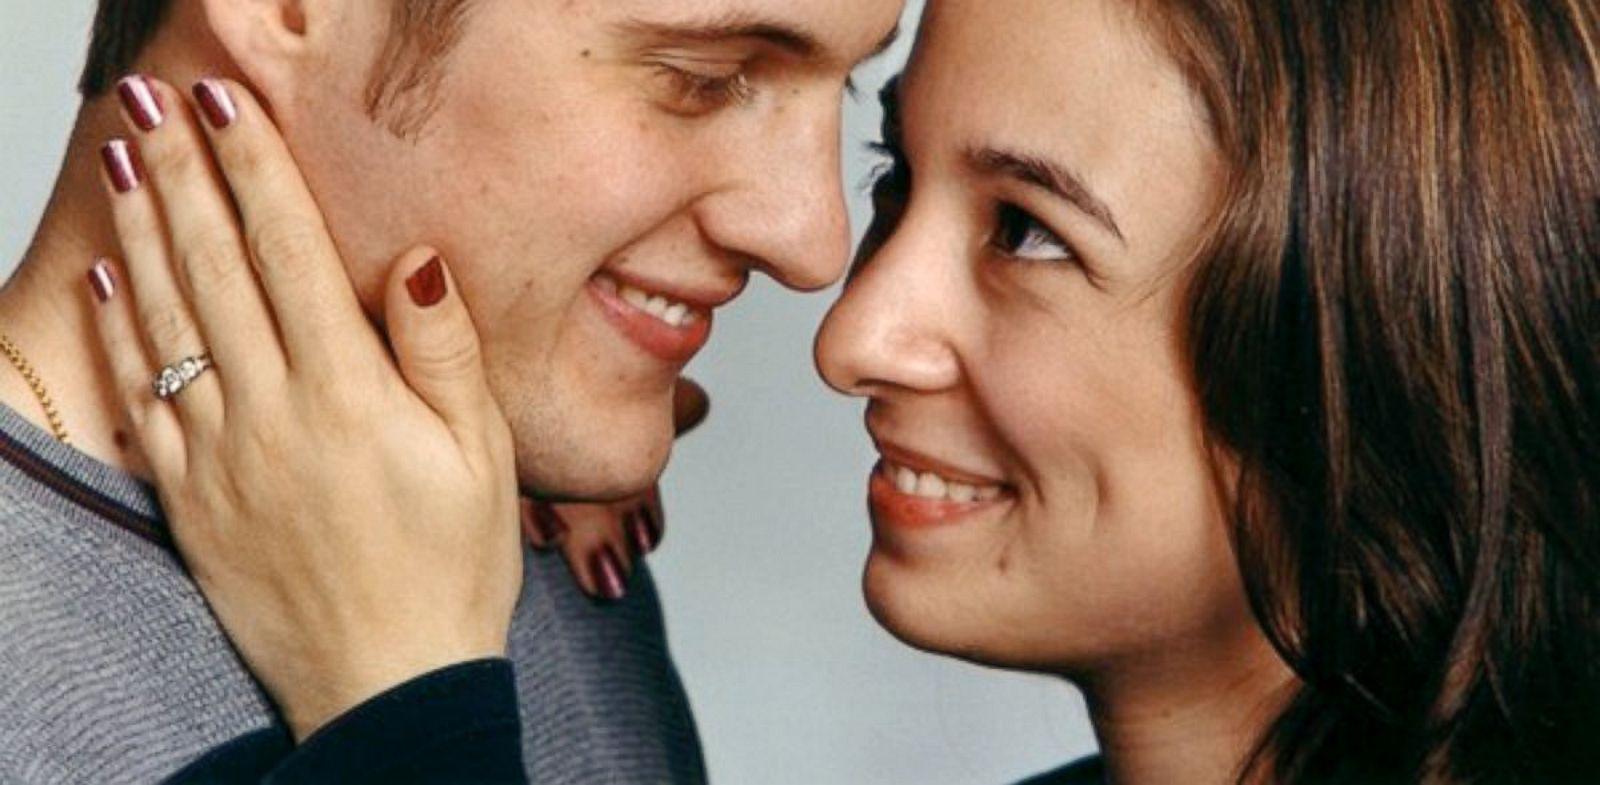 PHOTO: Cancer survivor Jennie Bushnell pictured with her husband Dan.